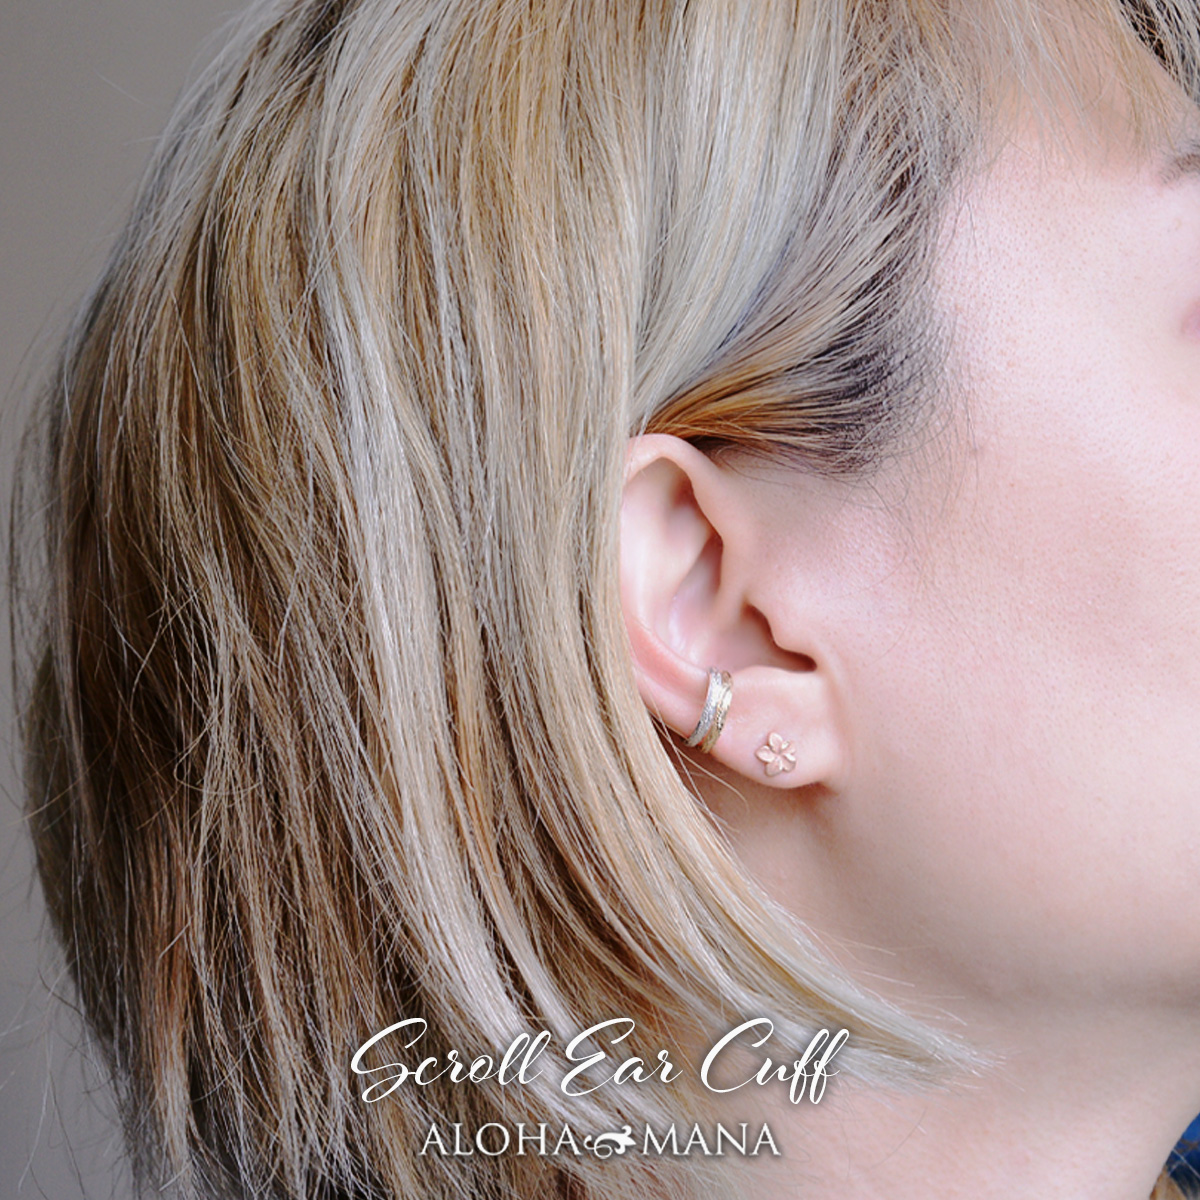 SILVER イヤーカフ 片耳用 ハワイアンジュエリー アクセサリー レディース 女性 メンズ 男性  スクロールイヤーカフS 2mm  シルバー 925 aer1501aa プレゼント ギフト